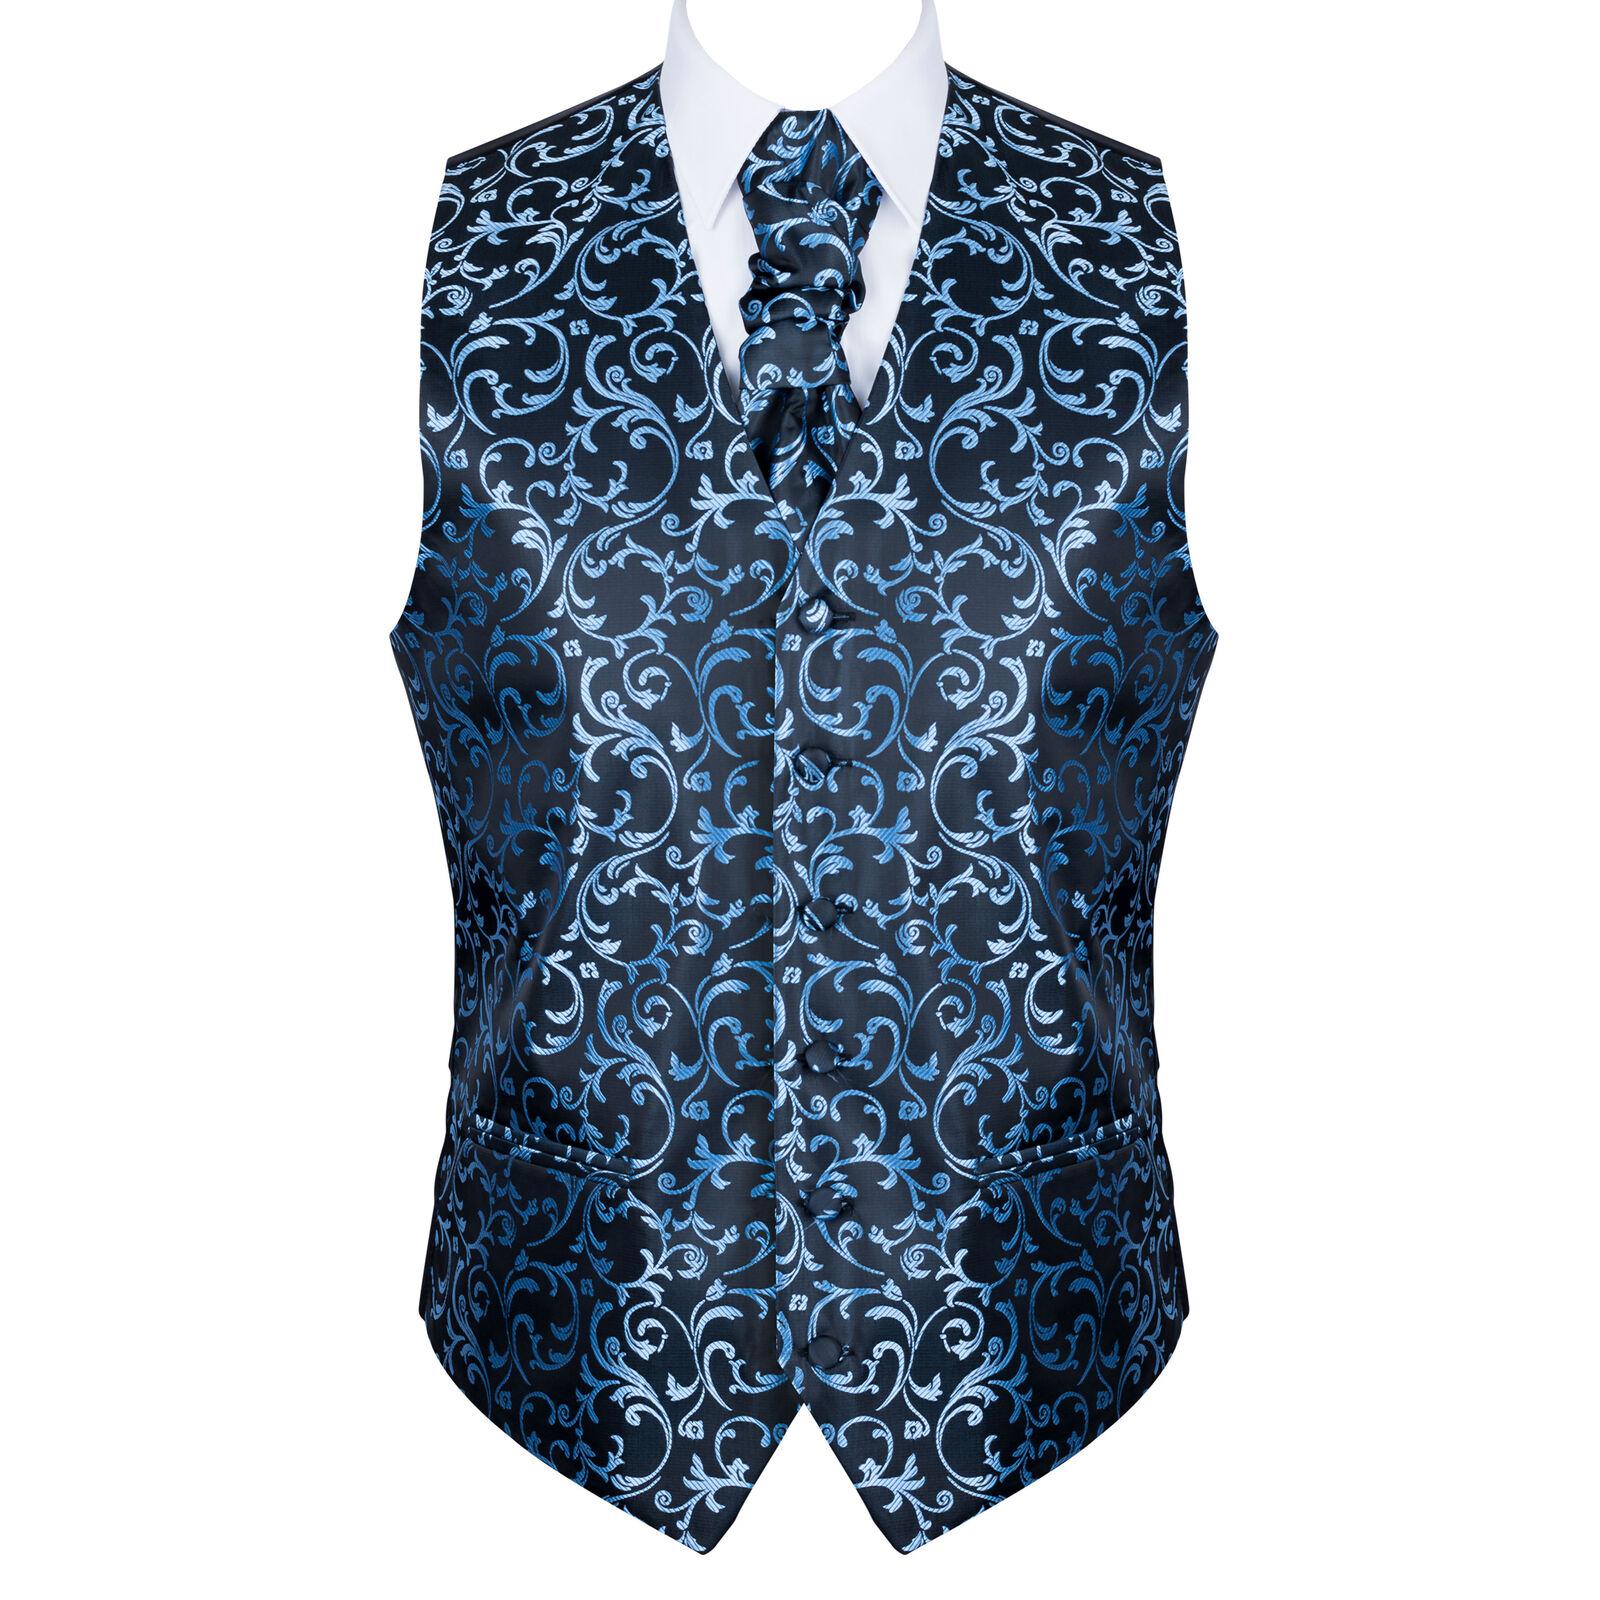 UK Men's Morning Blue on Black Wedding Waistcoat Swirl Leaf 6 Button Jacquard Su